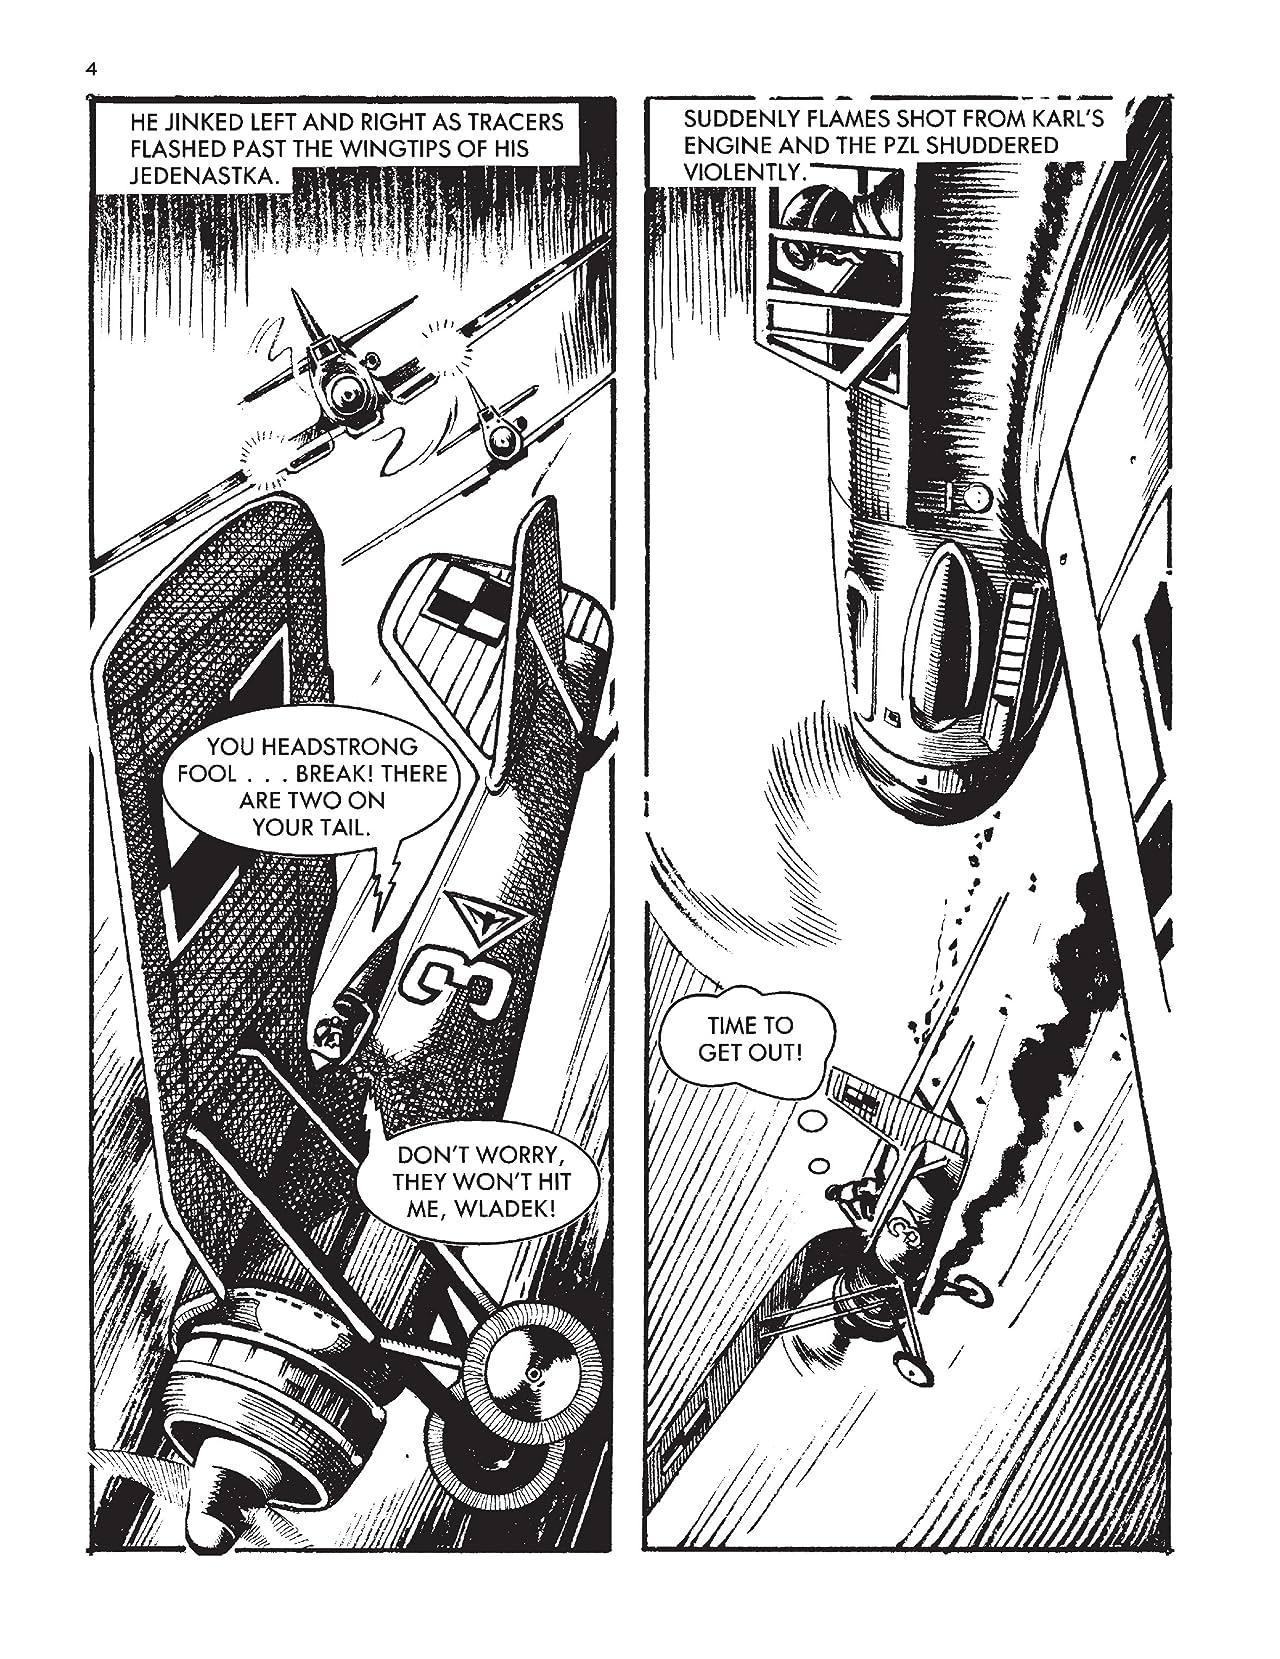 Commando #4878: Polish Pilot